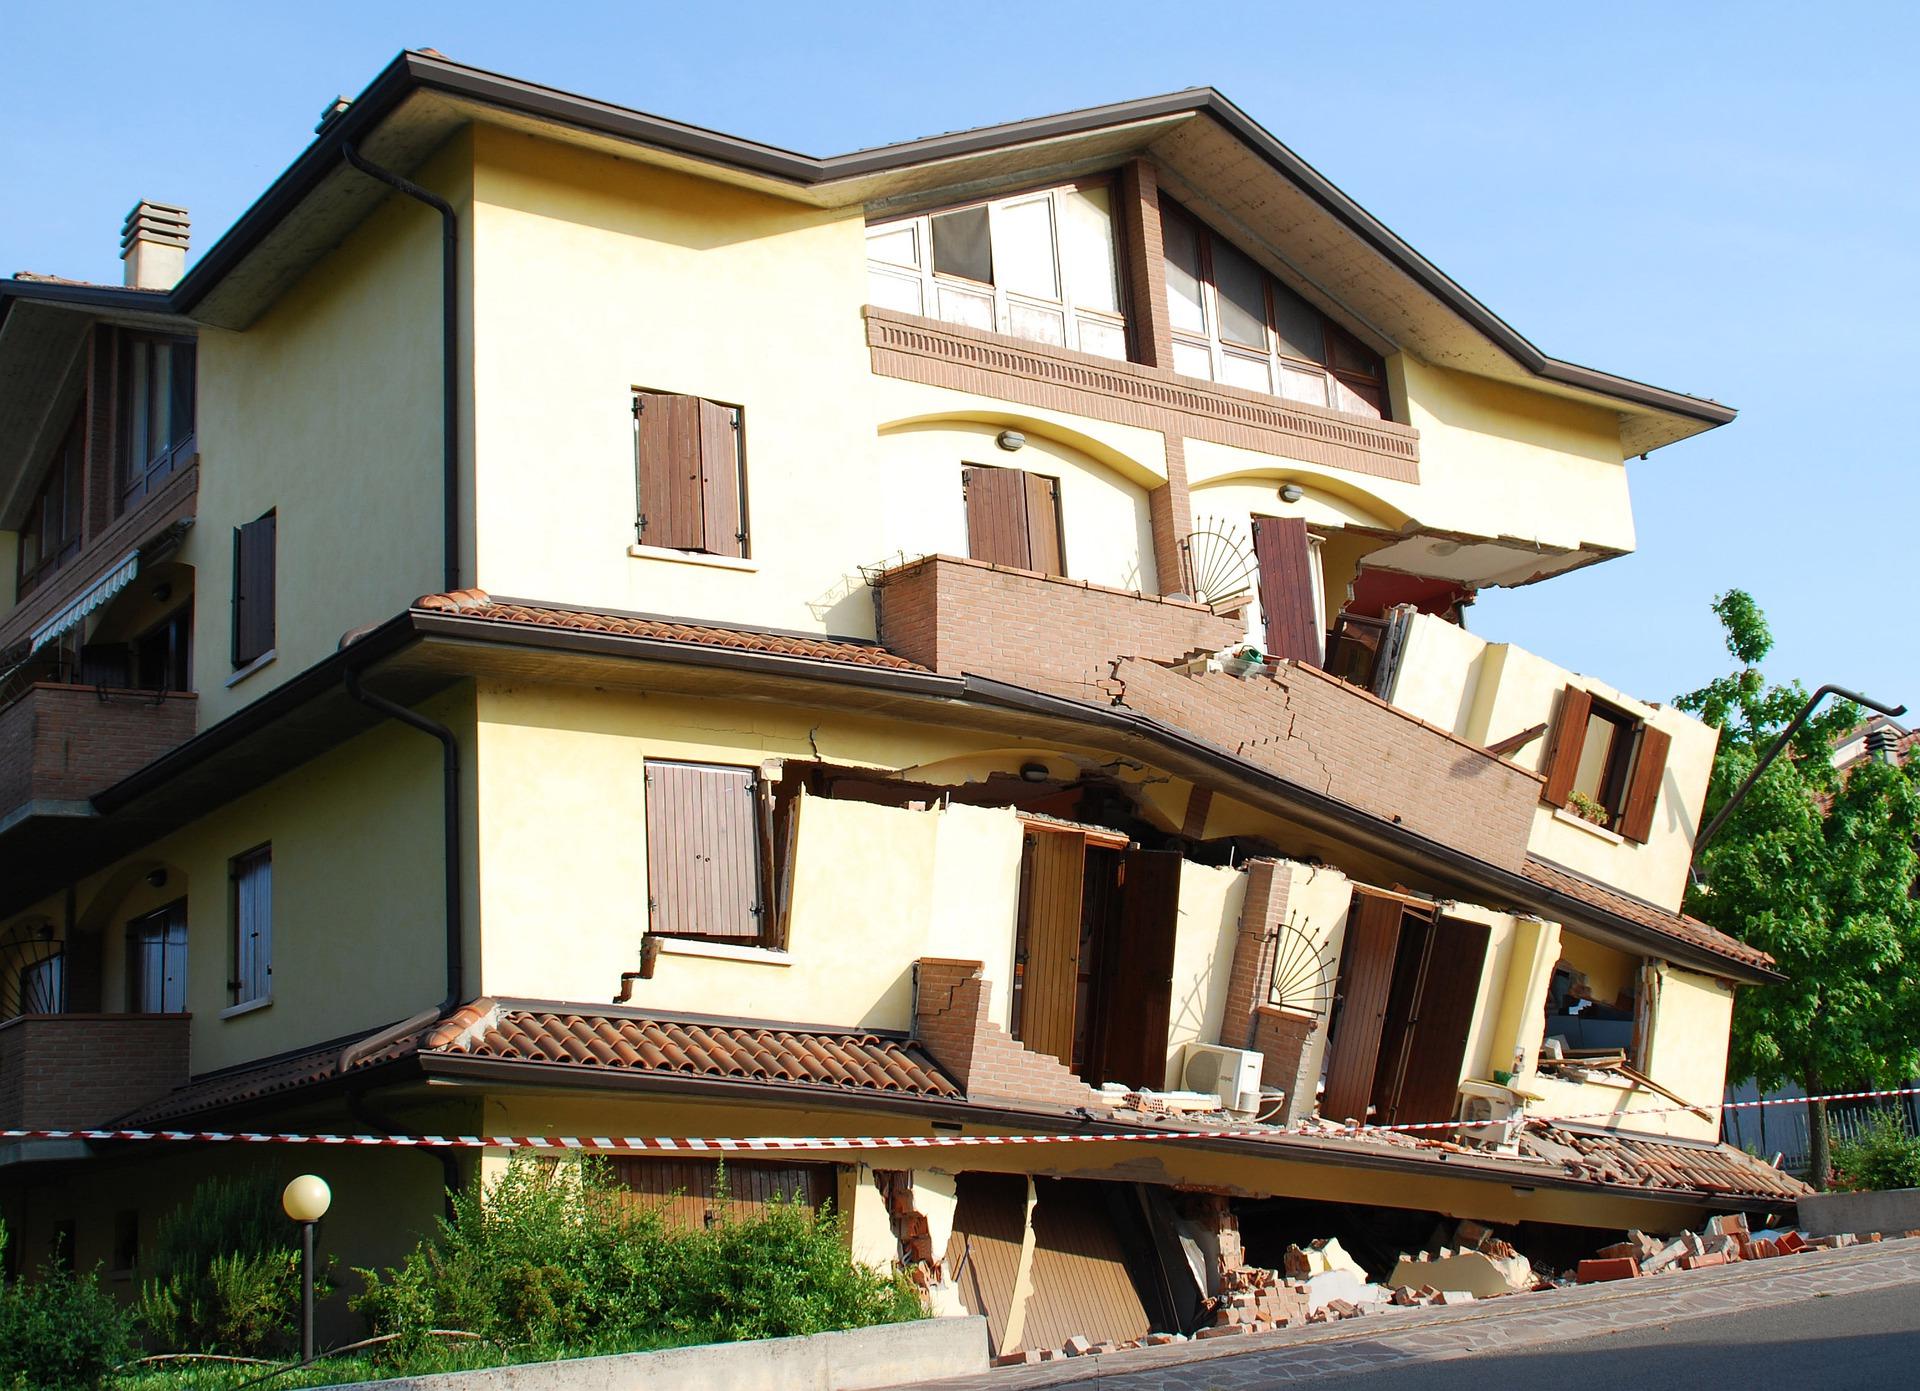 insurance-cover-earthquake-damage